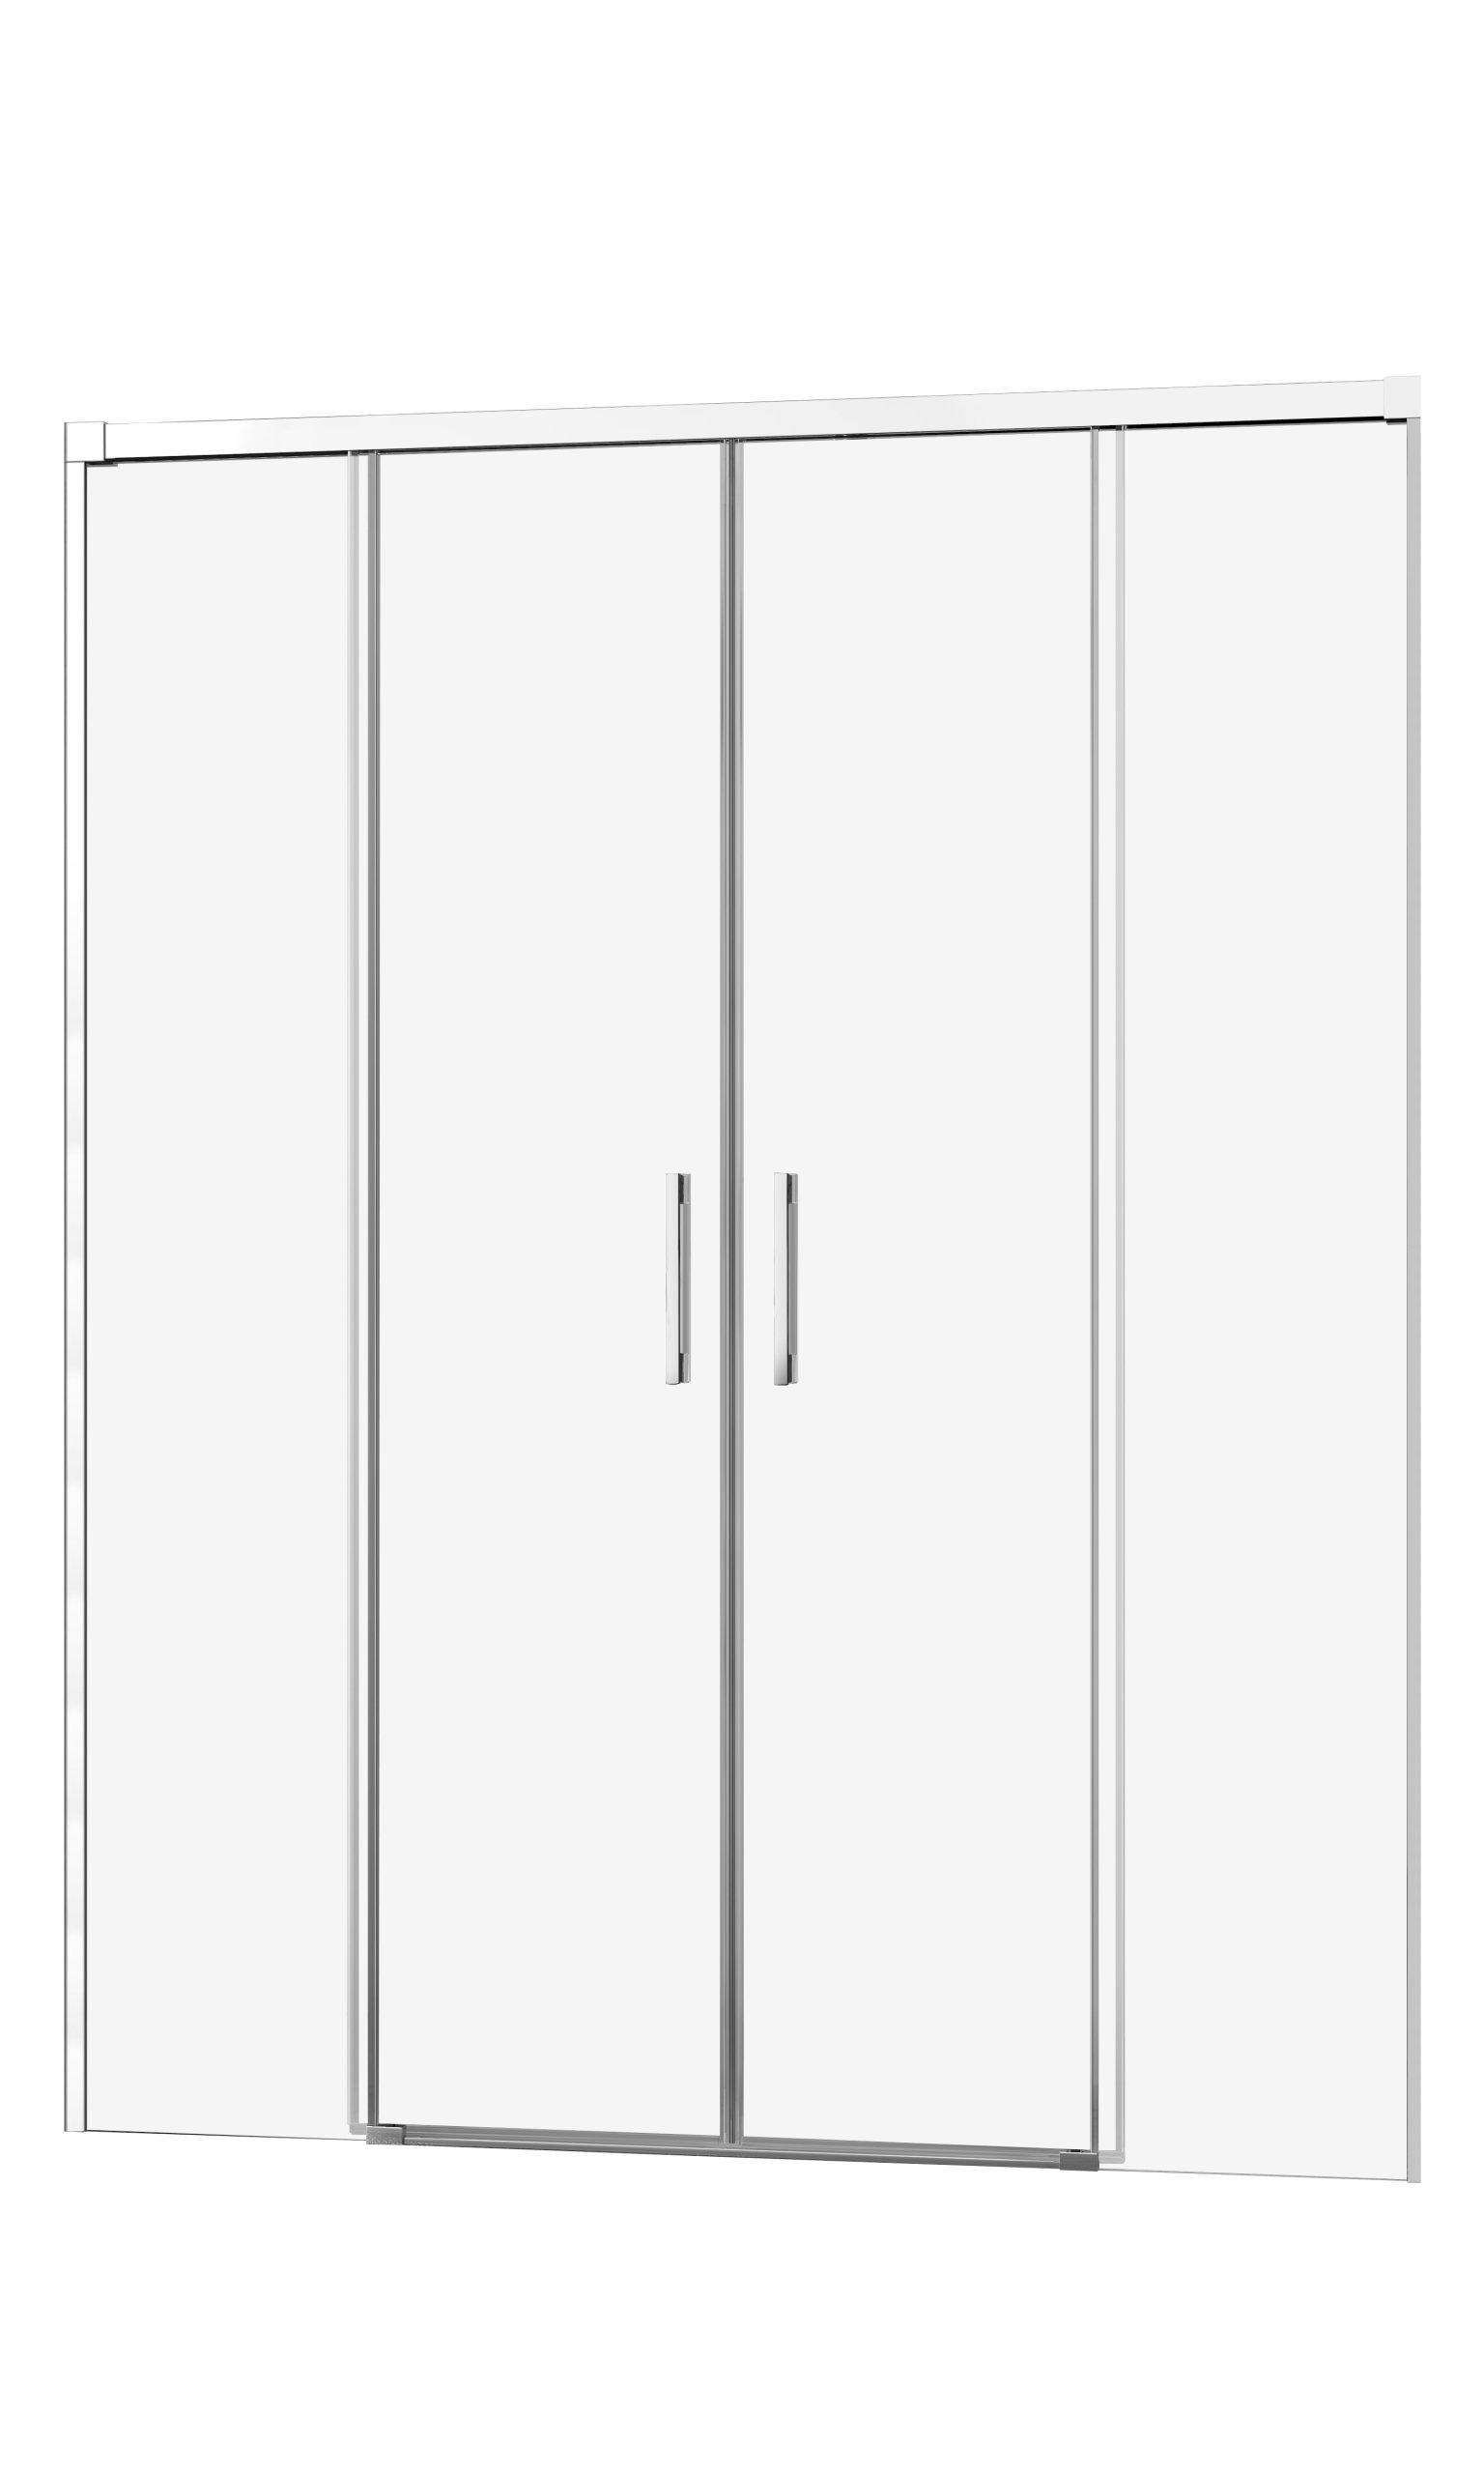 IDEA DWD 140x200 RADAWAY dvere do sprchy